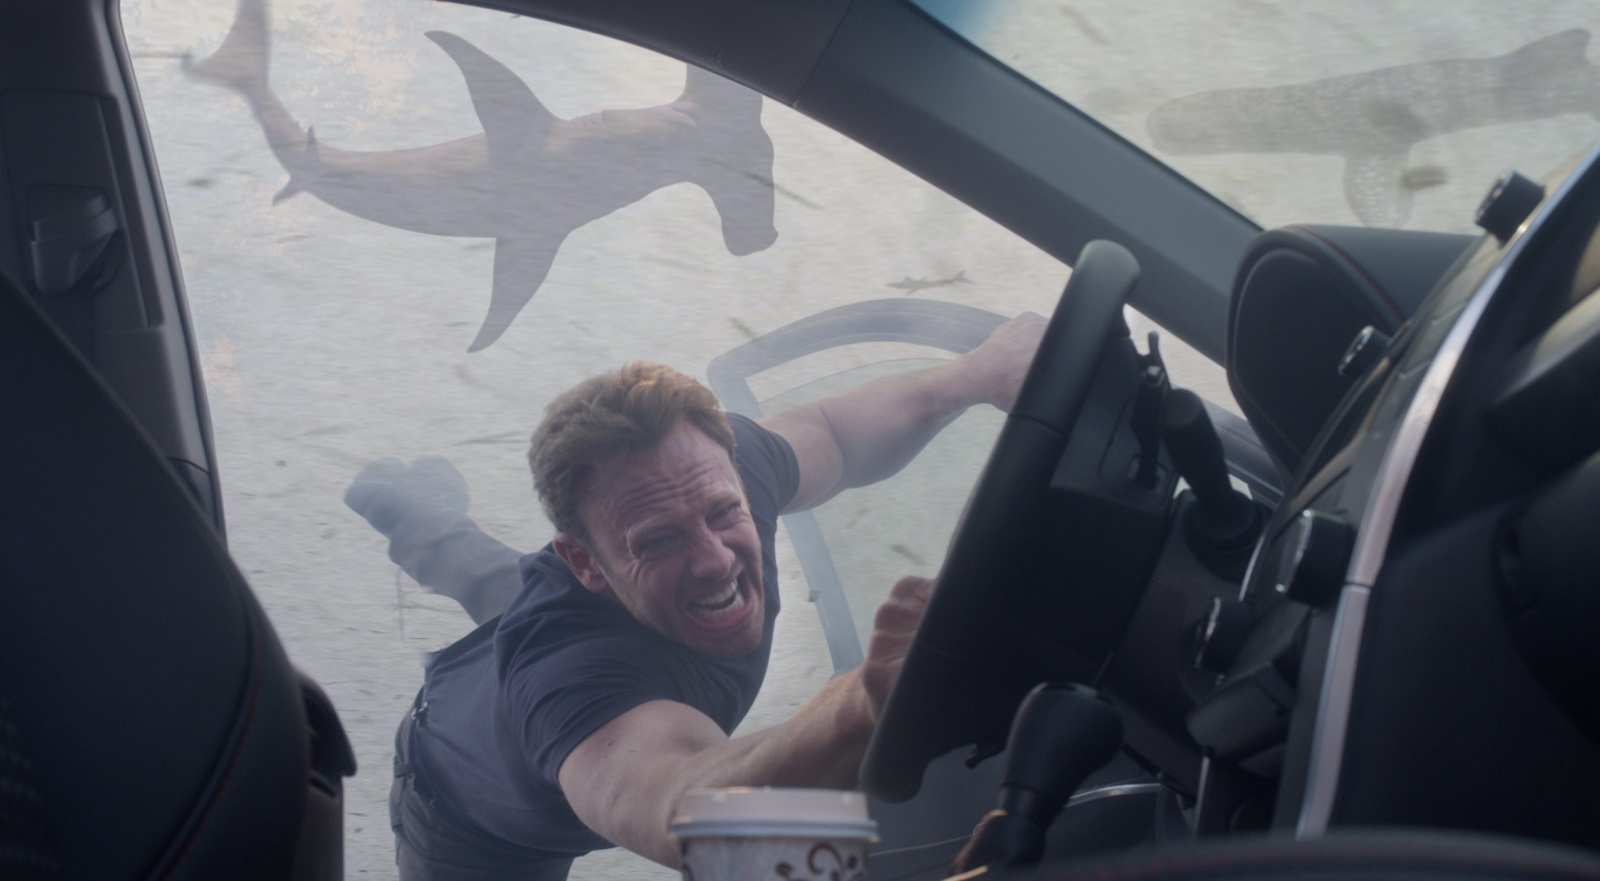 Ian Ziering as Fin Shepard in 'Sharknado 3: Oh Hell No!' (Photo by: Syfy)